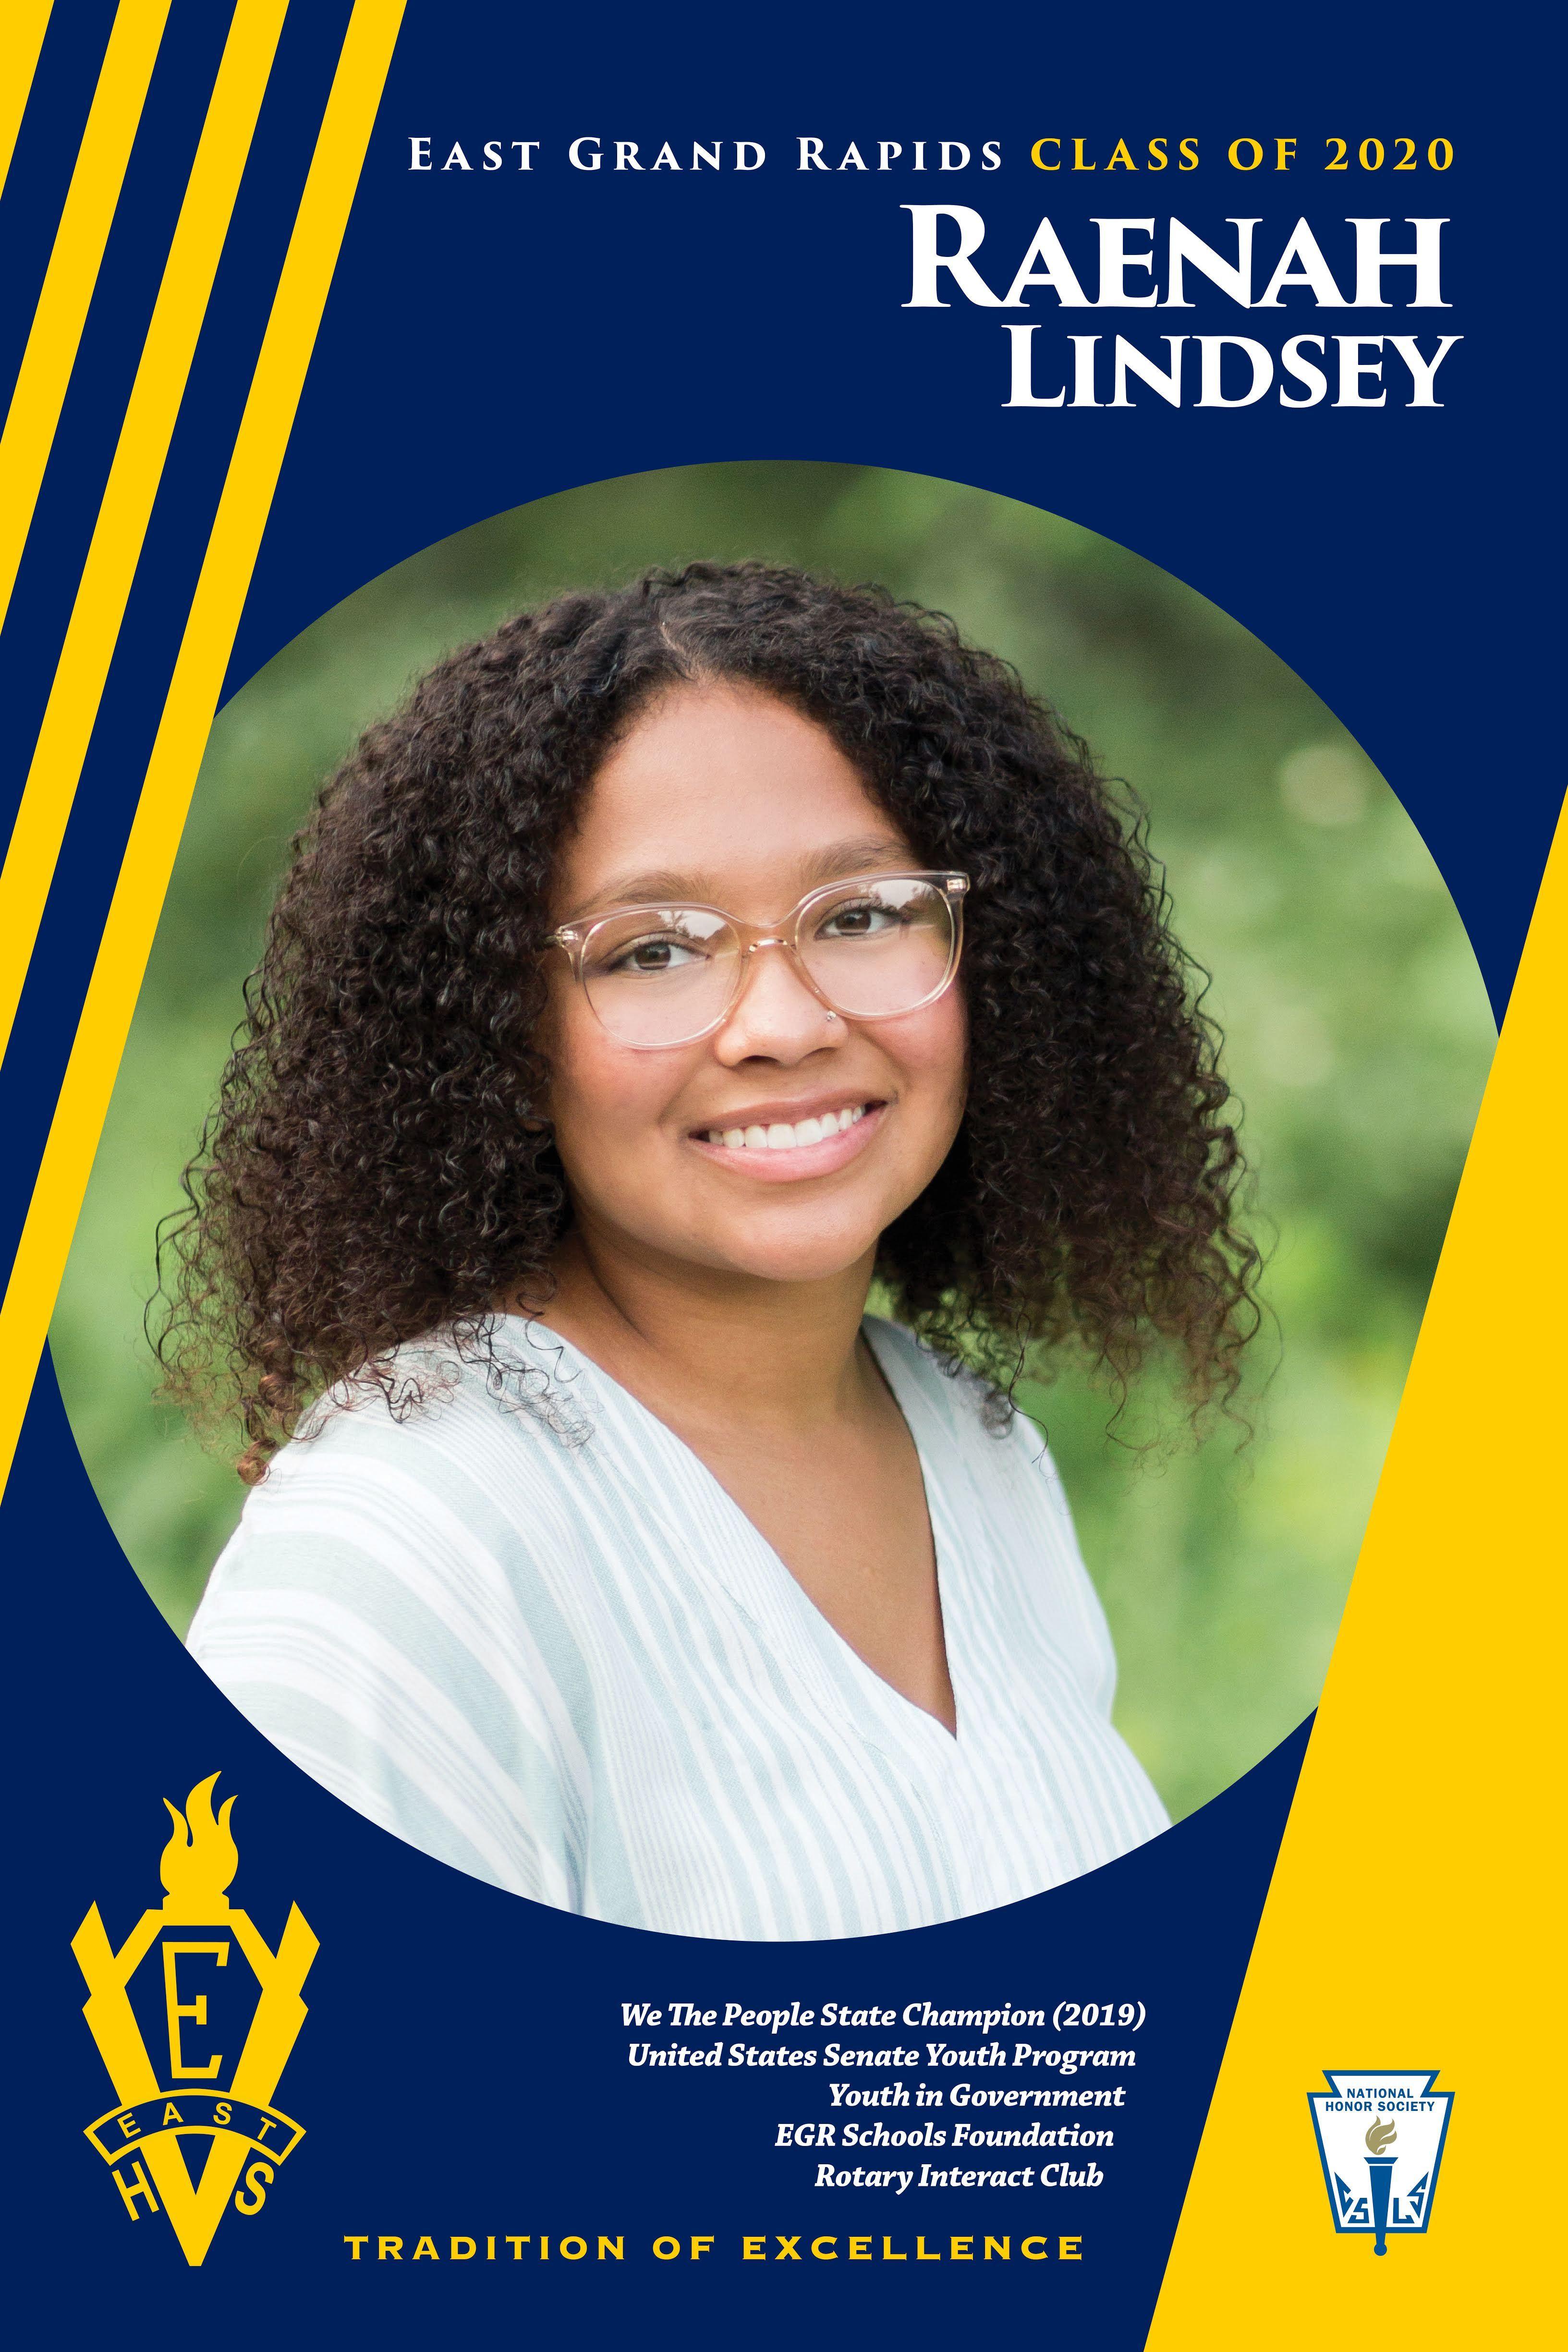 Raenah Lindsey